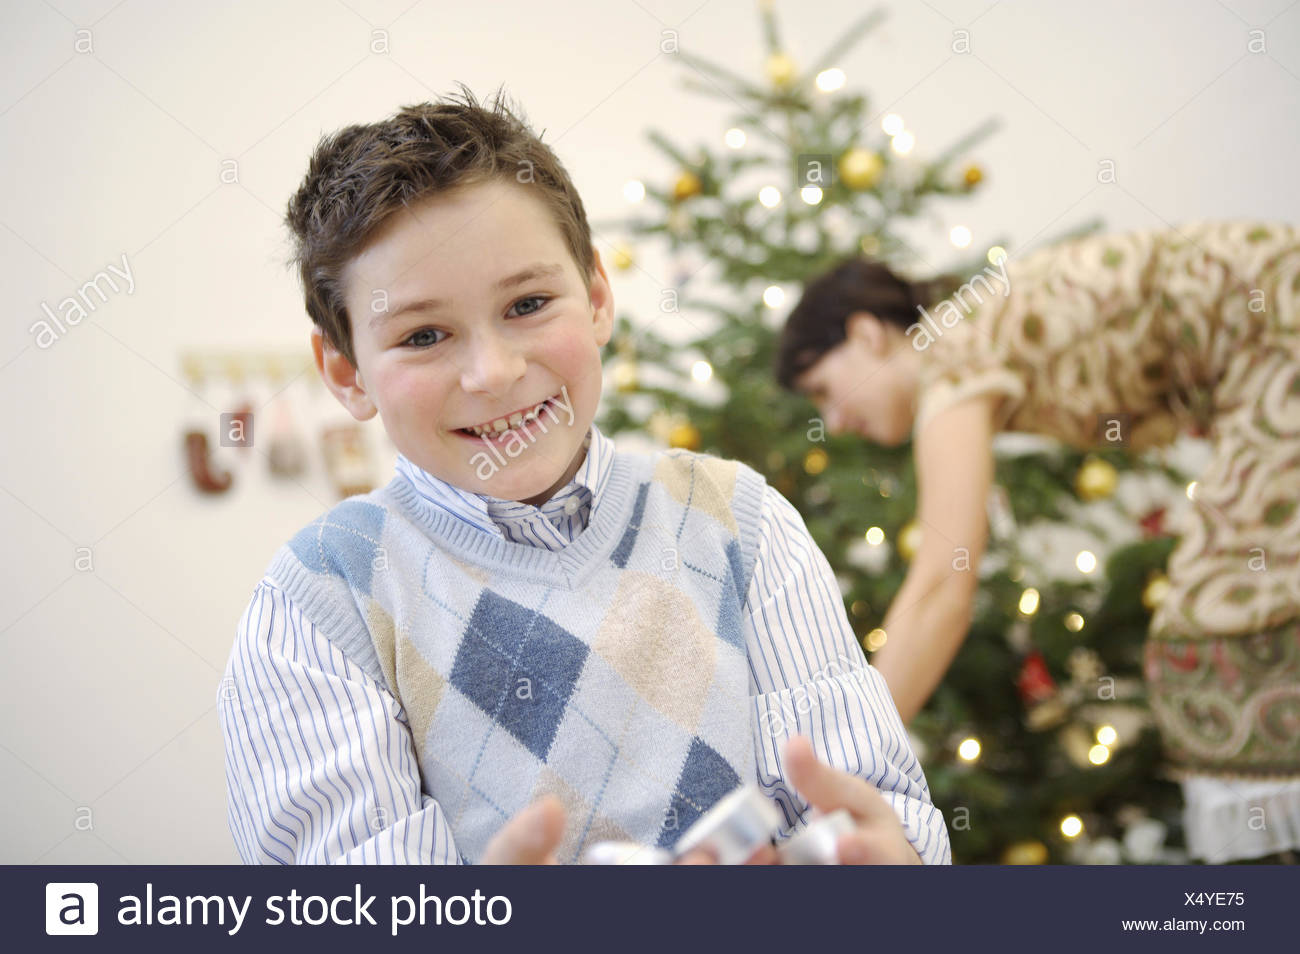 Boy smiling at Christmastime - Stock Image